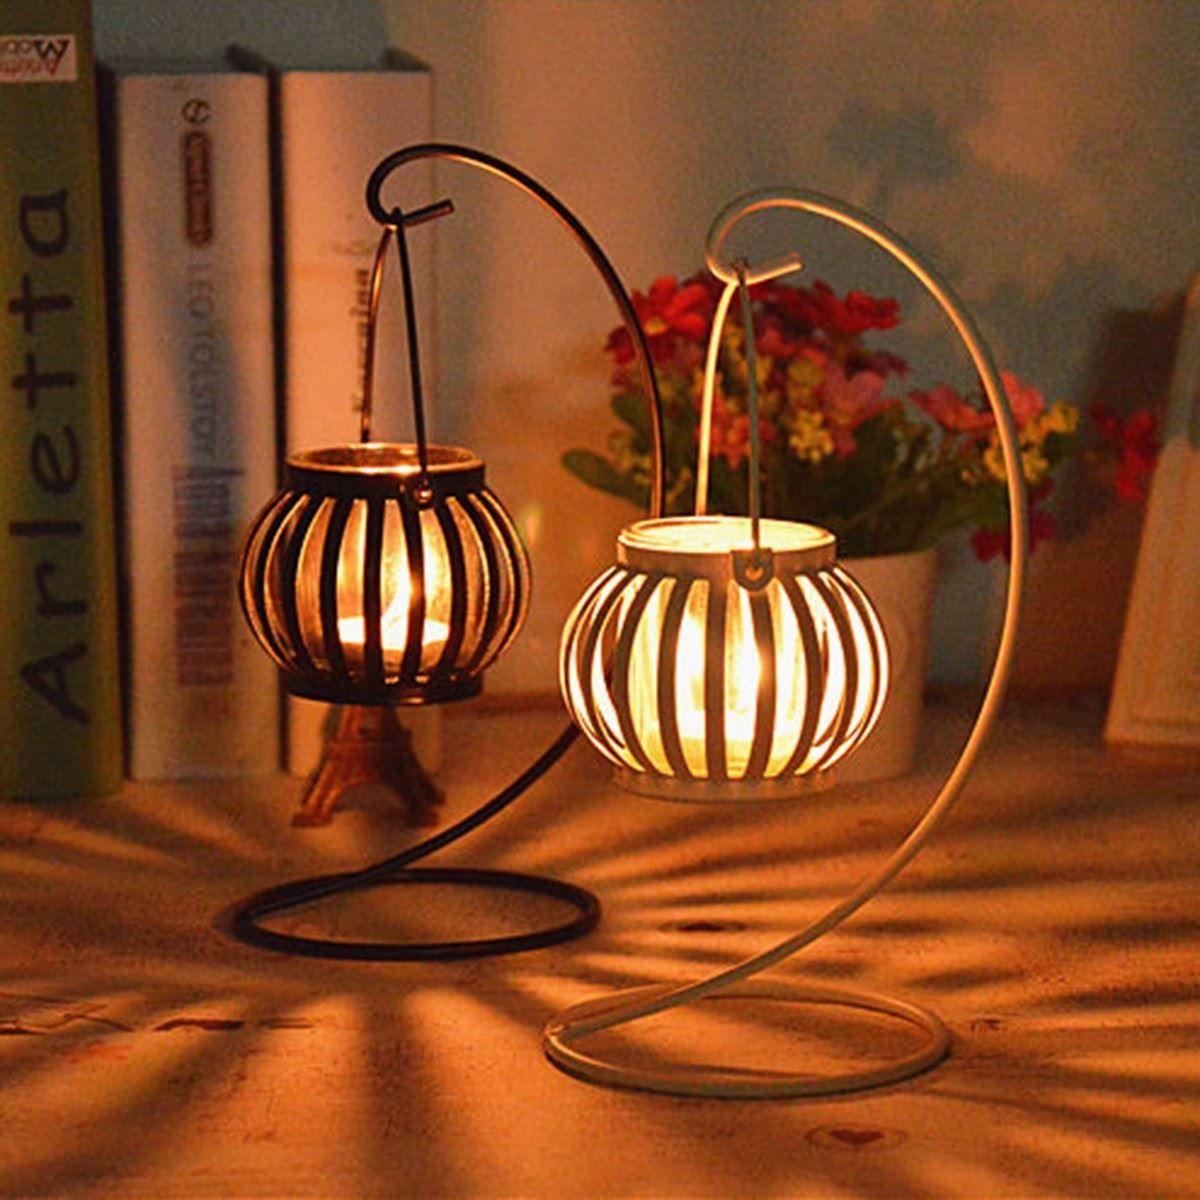 New European Retro Metal Iron Antique Candlestick Pillar Tea Light ...